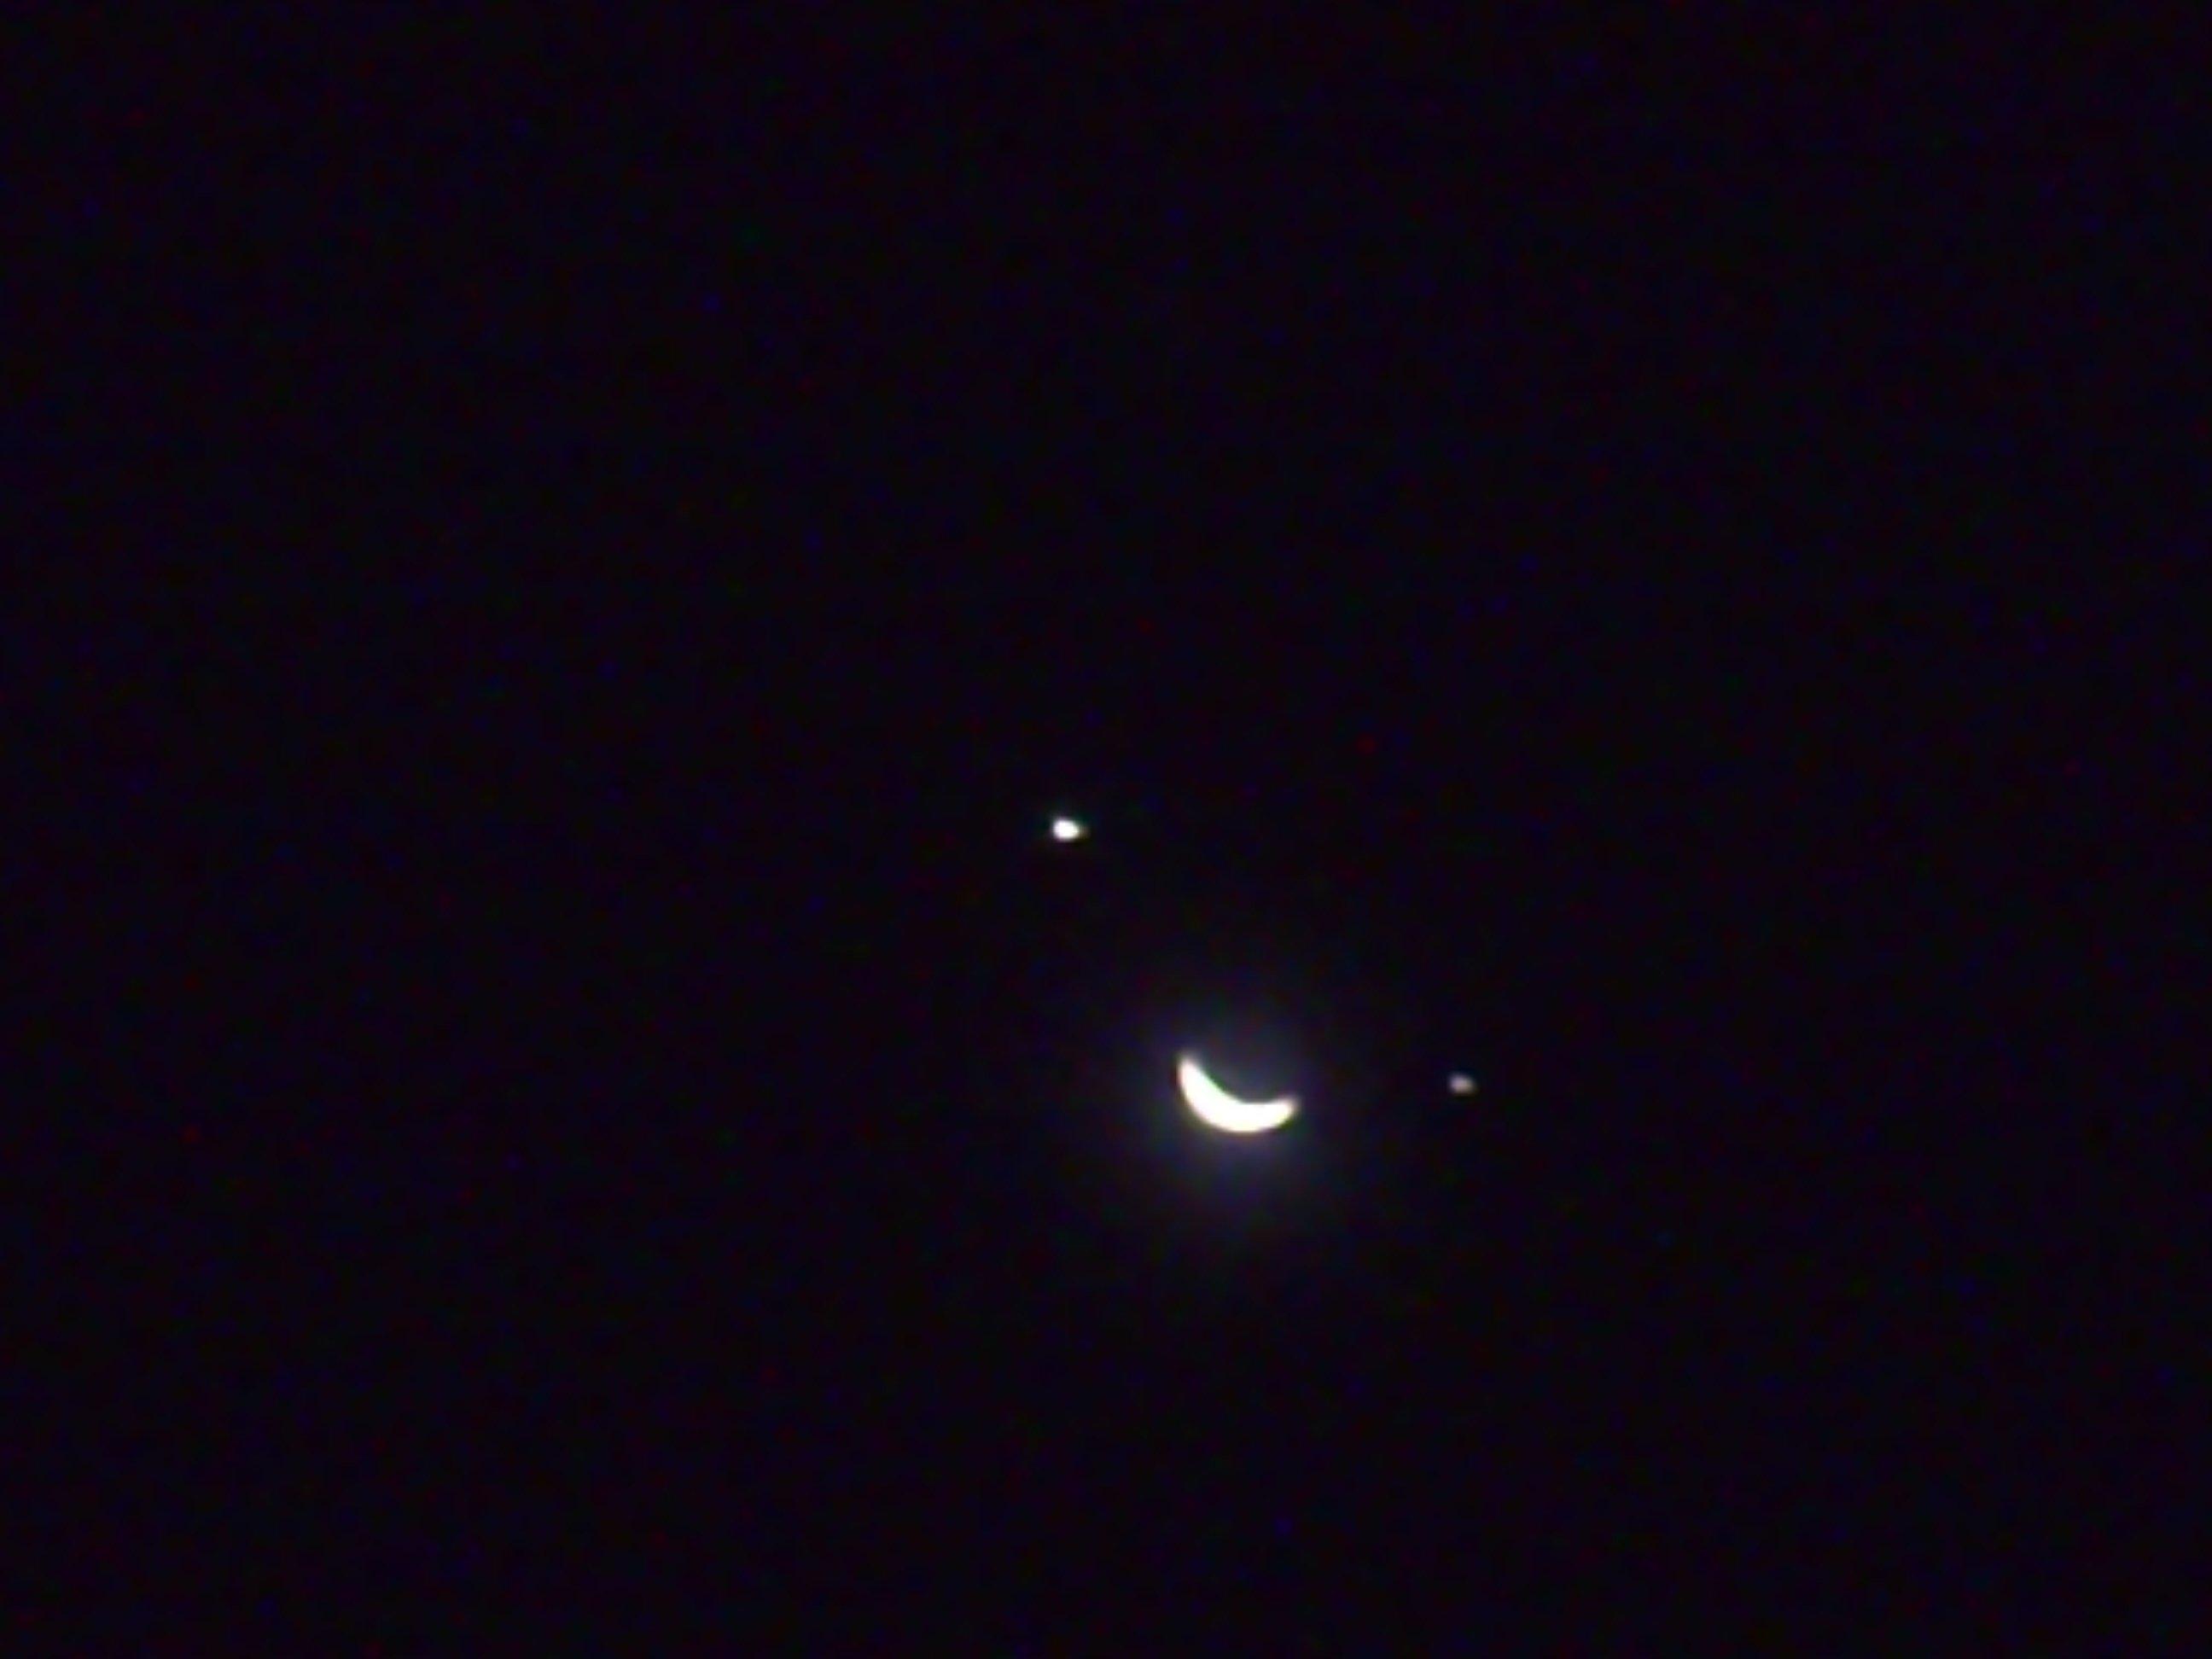 regardez la lune et les deux toiles dans le ciel ammaara s blog. Black Bedroom Furniture Sets. Home Design Ideas